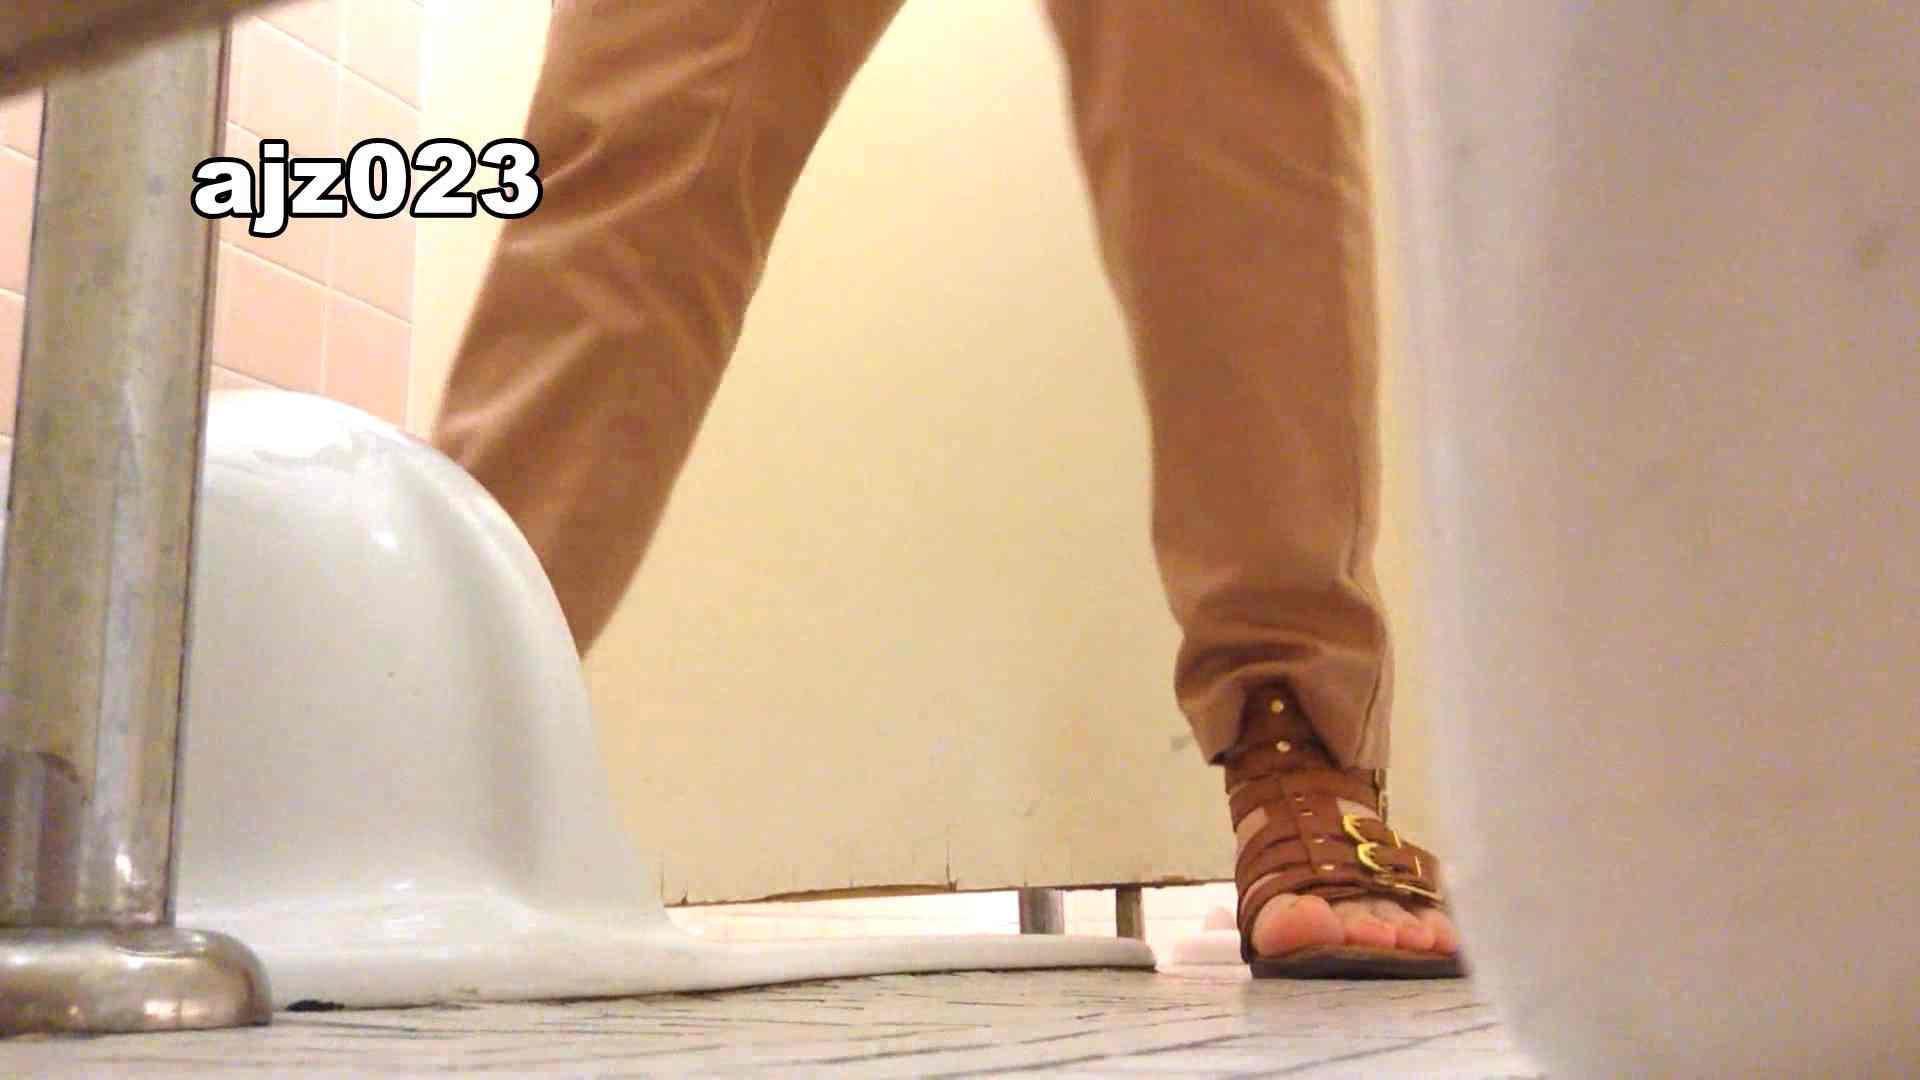 某有名大学女性洗面所 vol.23 洗面所 隠し撮りオマンコ動画紹介 101画像 27